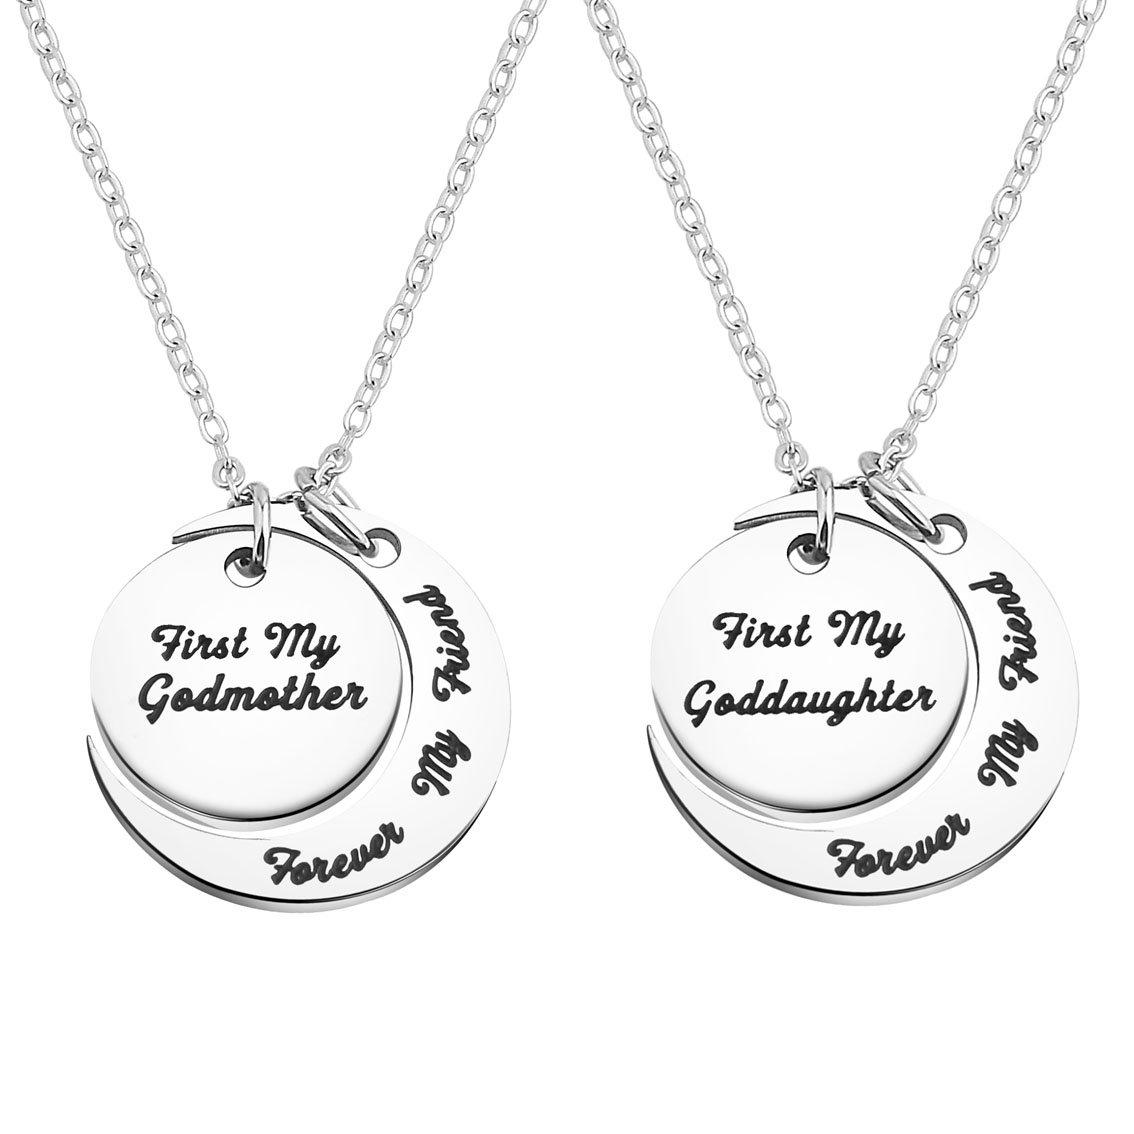 BNQL Godmother Goddaughter Necklace Forever My Friend Necklace Christening Gift (necklace set)